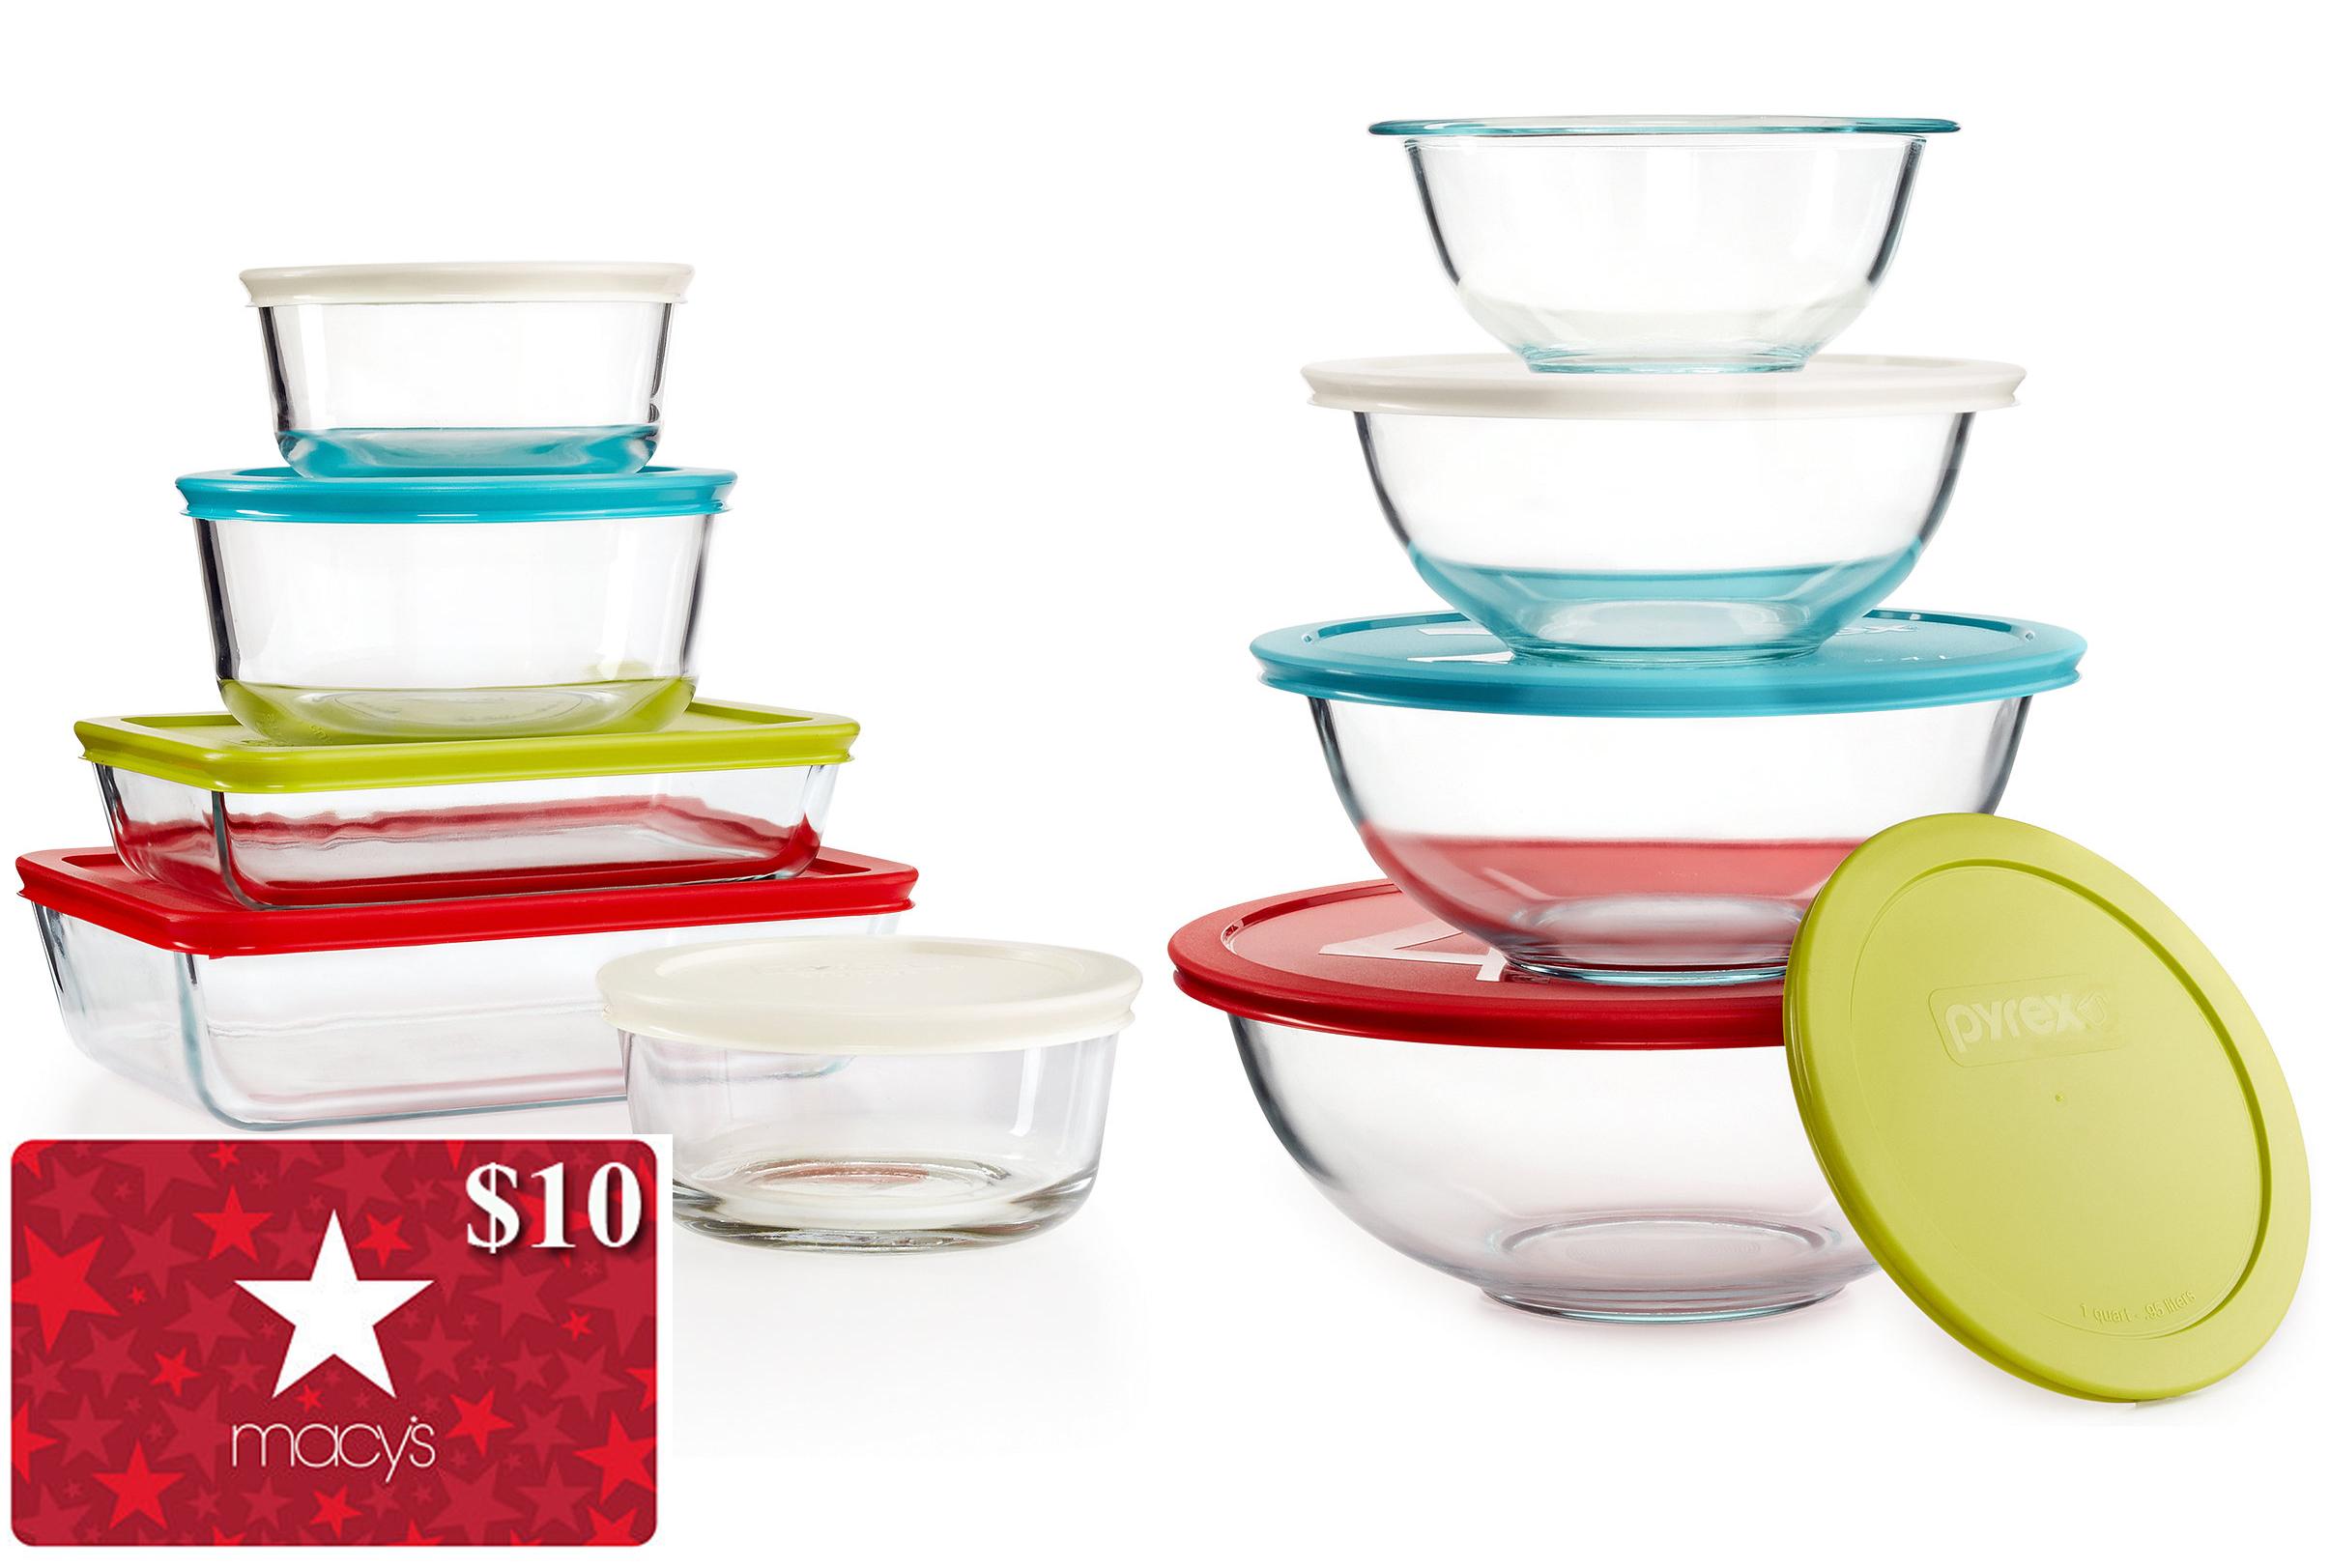 10 Pc Pyrex Set + 8 Pc Bowl Set + $10 Macys Egift Card   Slickdeals.net